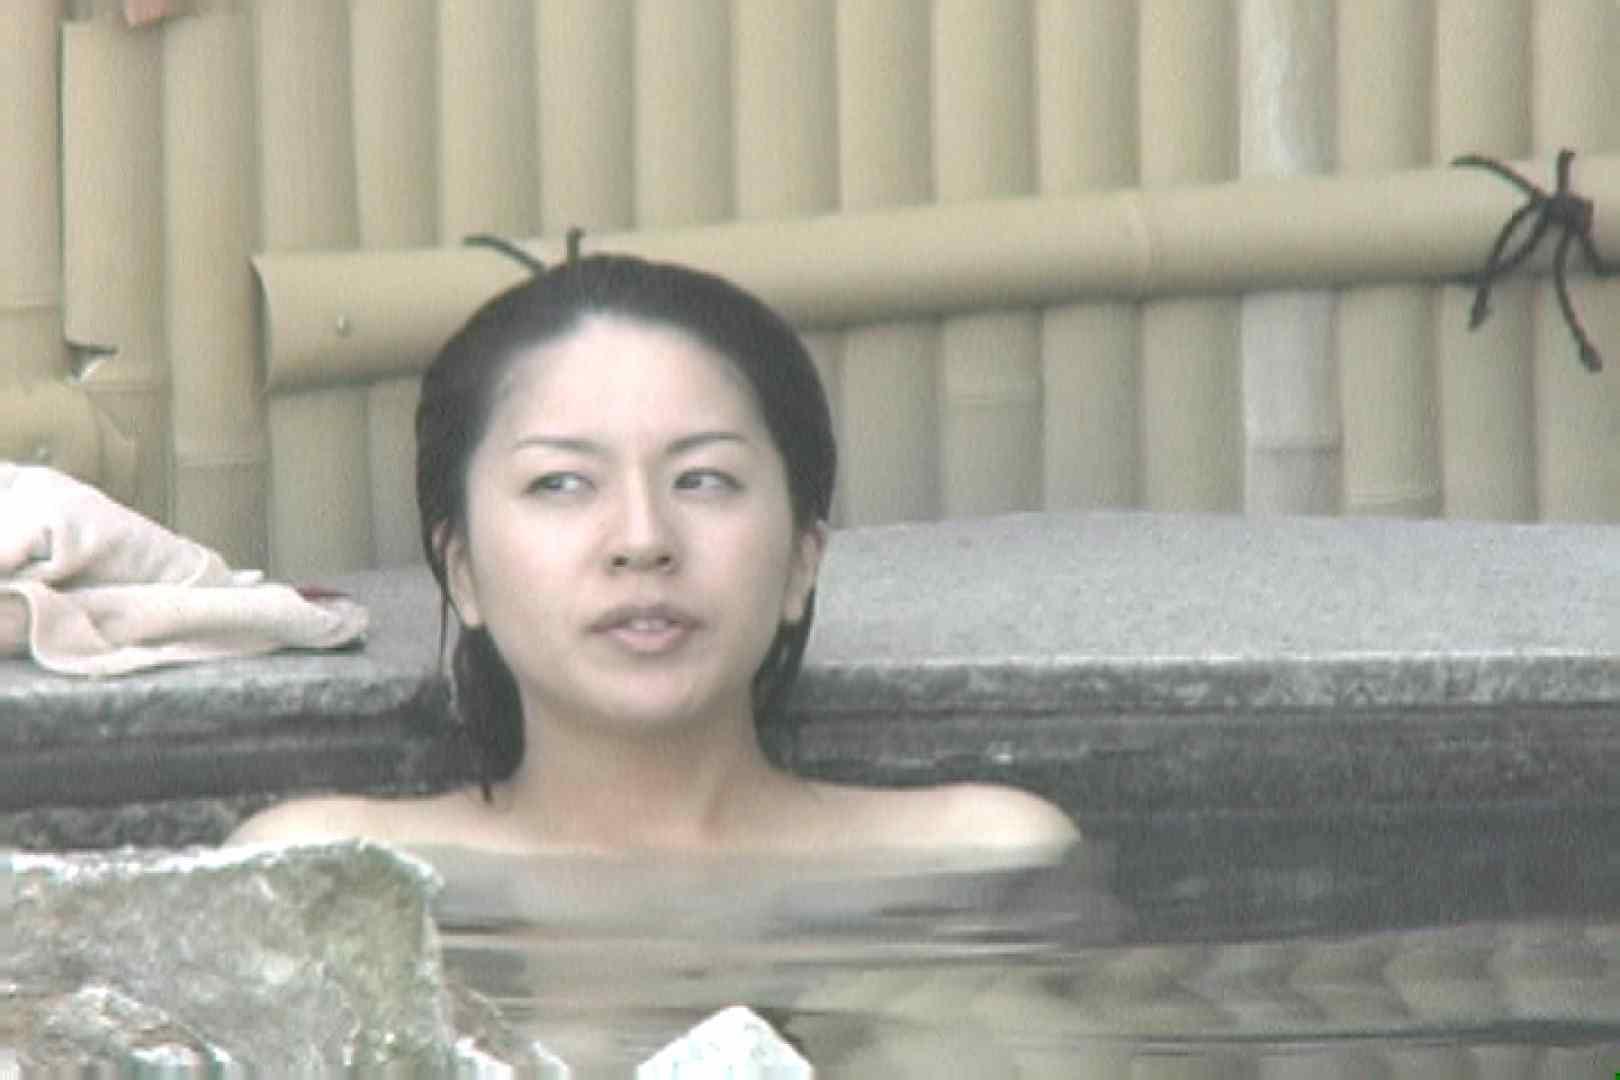 Aquaな露天風呂Vol.694 盗撮 | OLエロ画像  110PICs 40